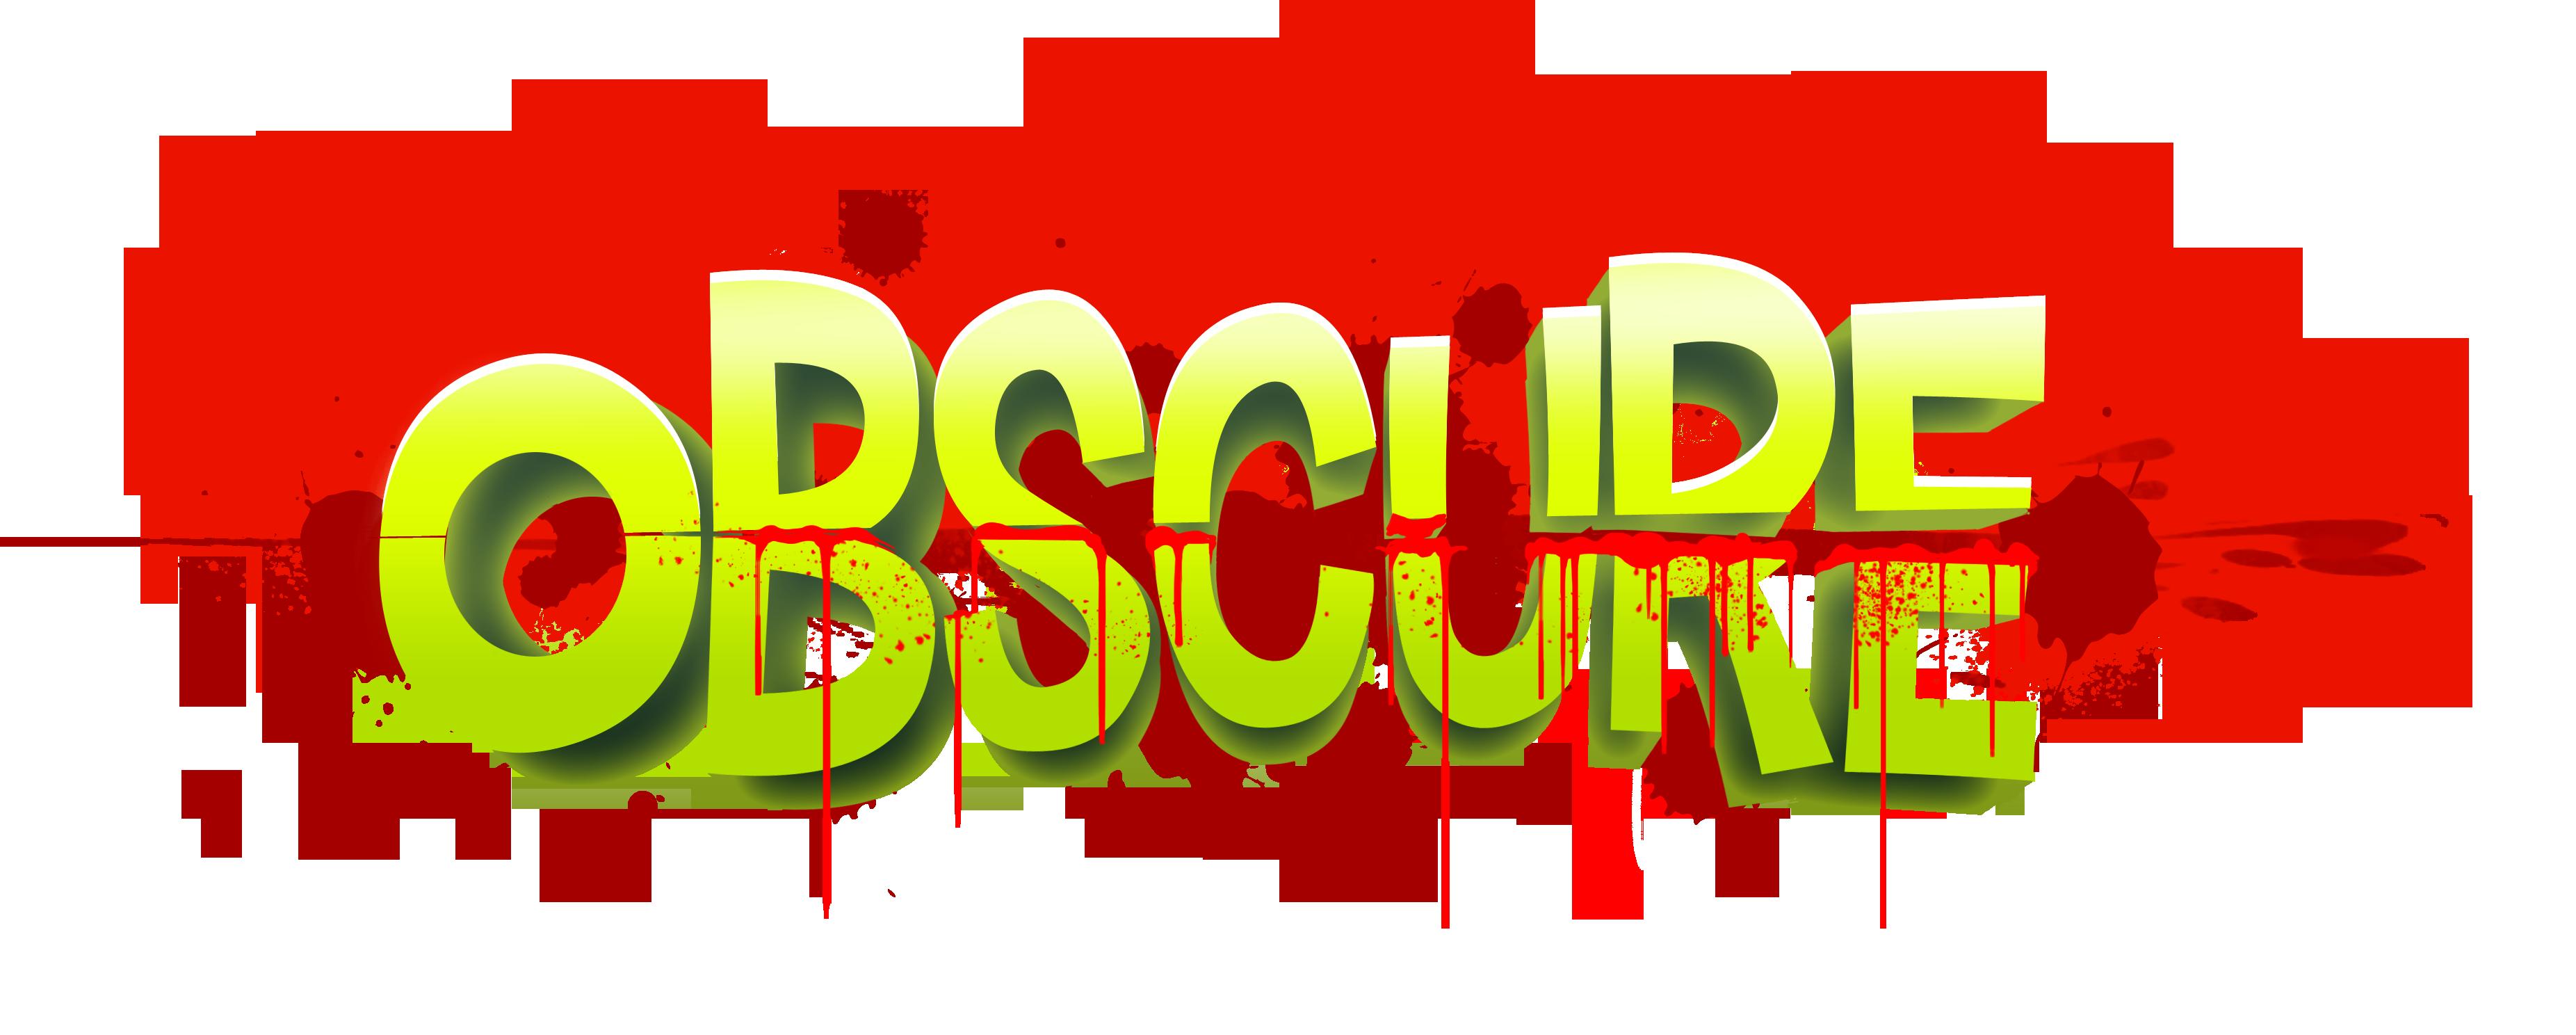 Obscure logo